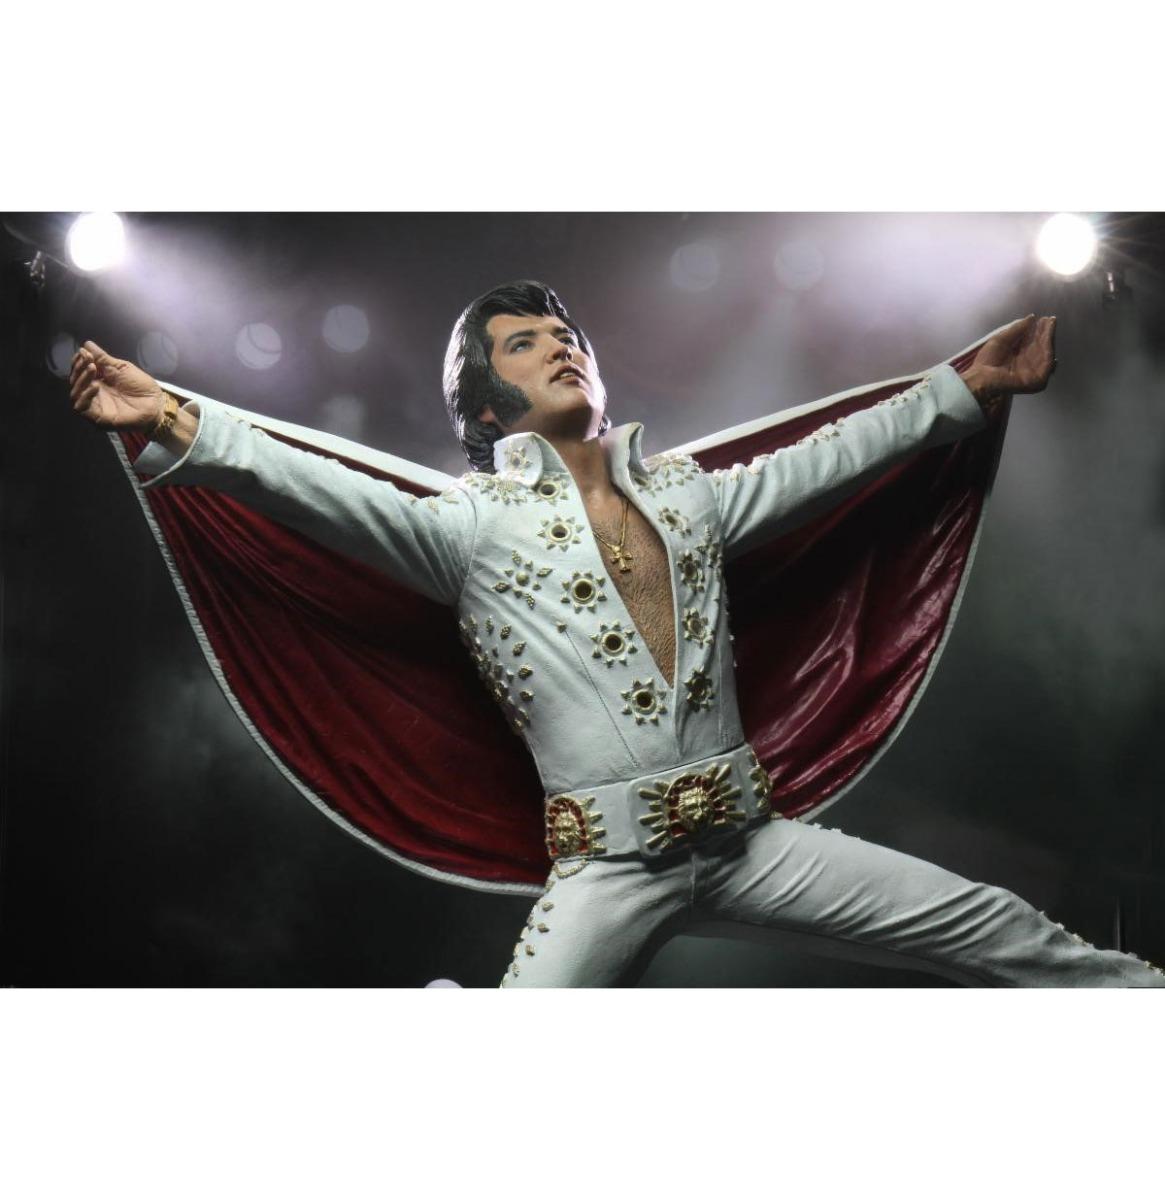 Elvis Presley: Elvis Presley Live in 72 - 7 inch Actiefiguur